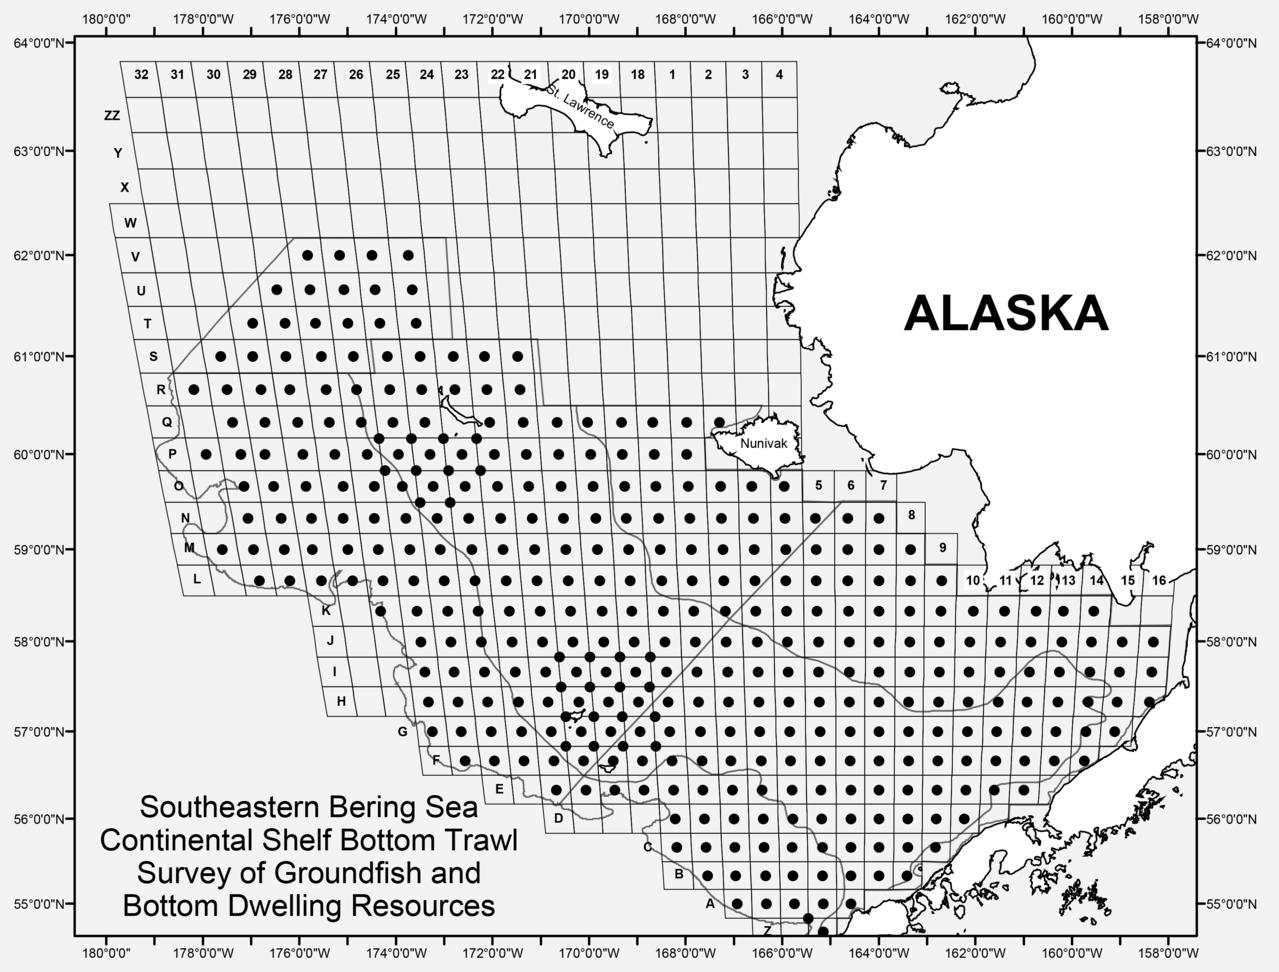 Southeastern Bering Sea Continental Shelf Bottom Trawl Survey of Groundfish and Bottom Dwelling Resources (map plot)